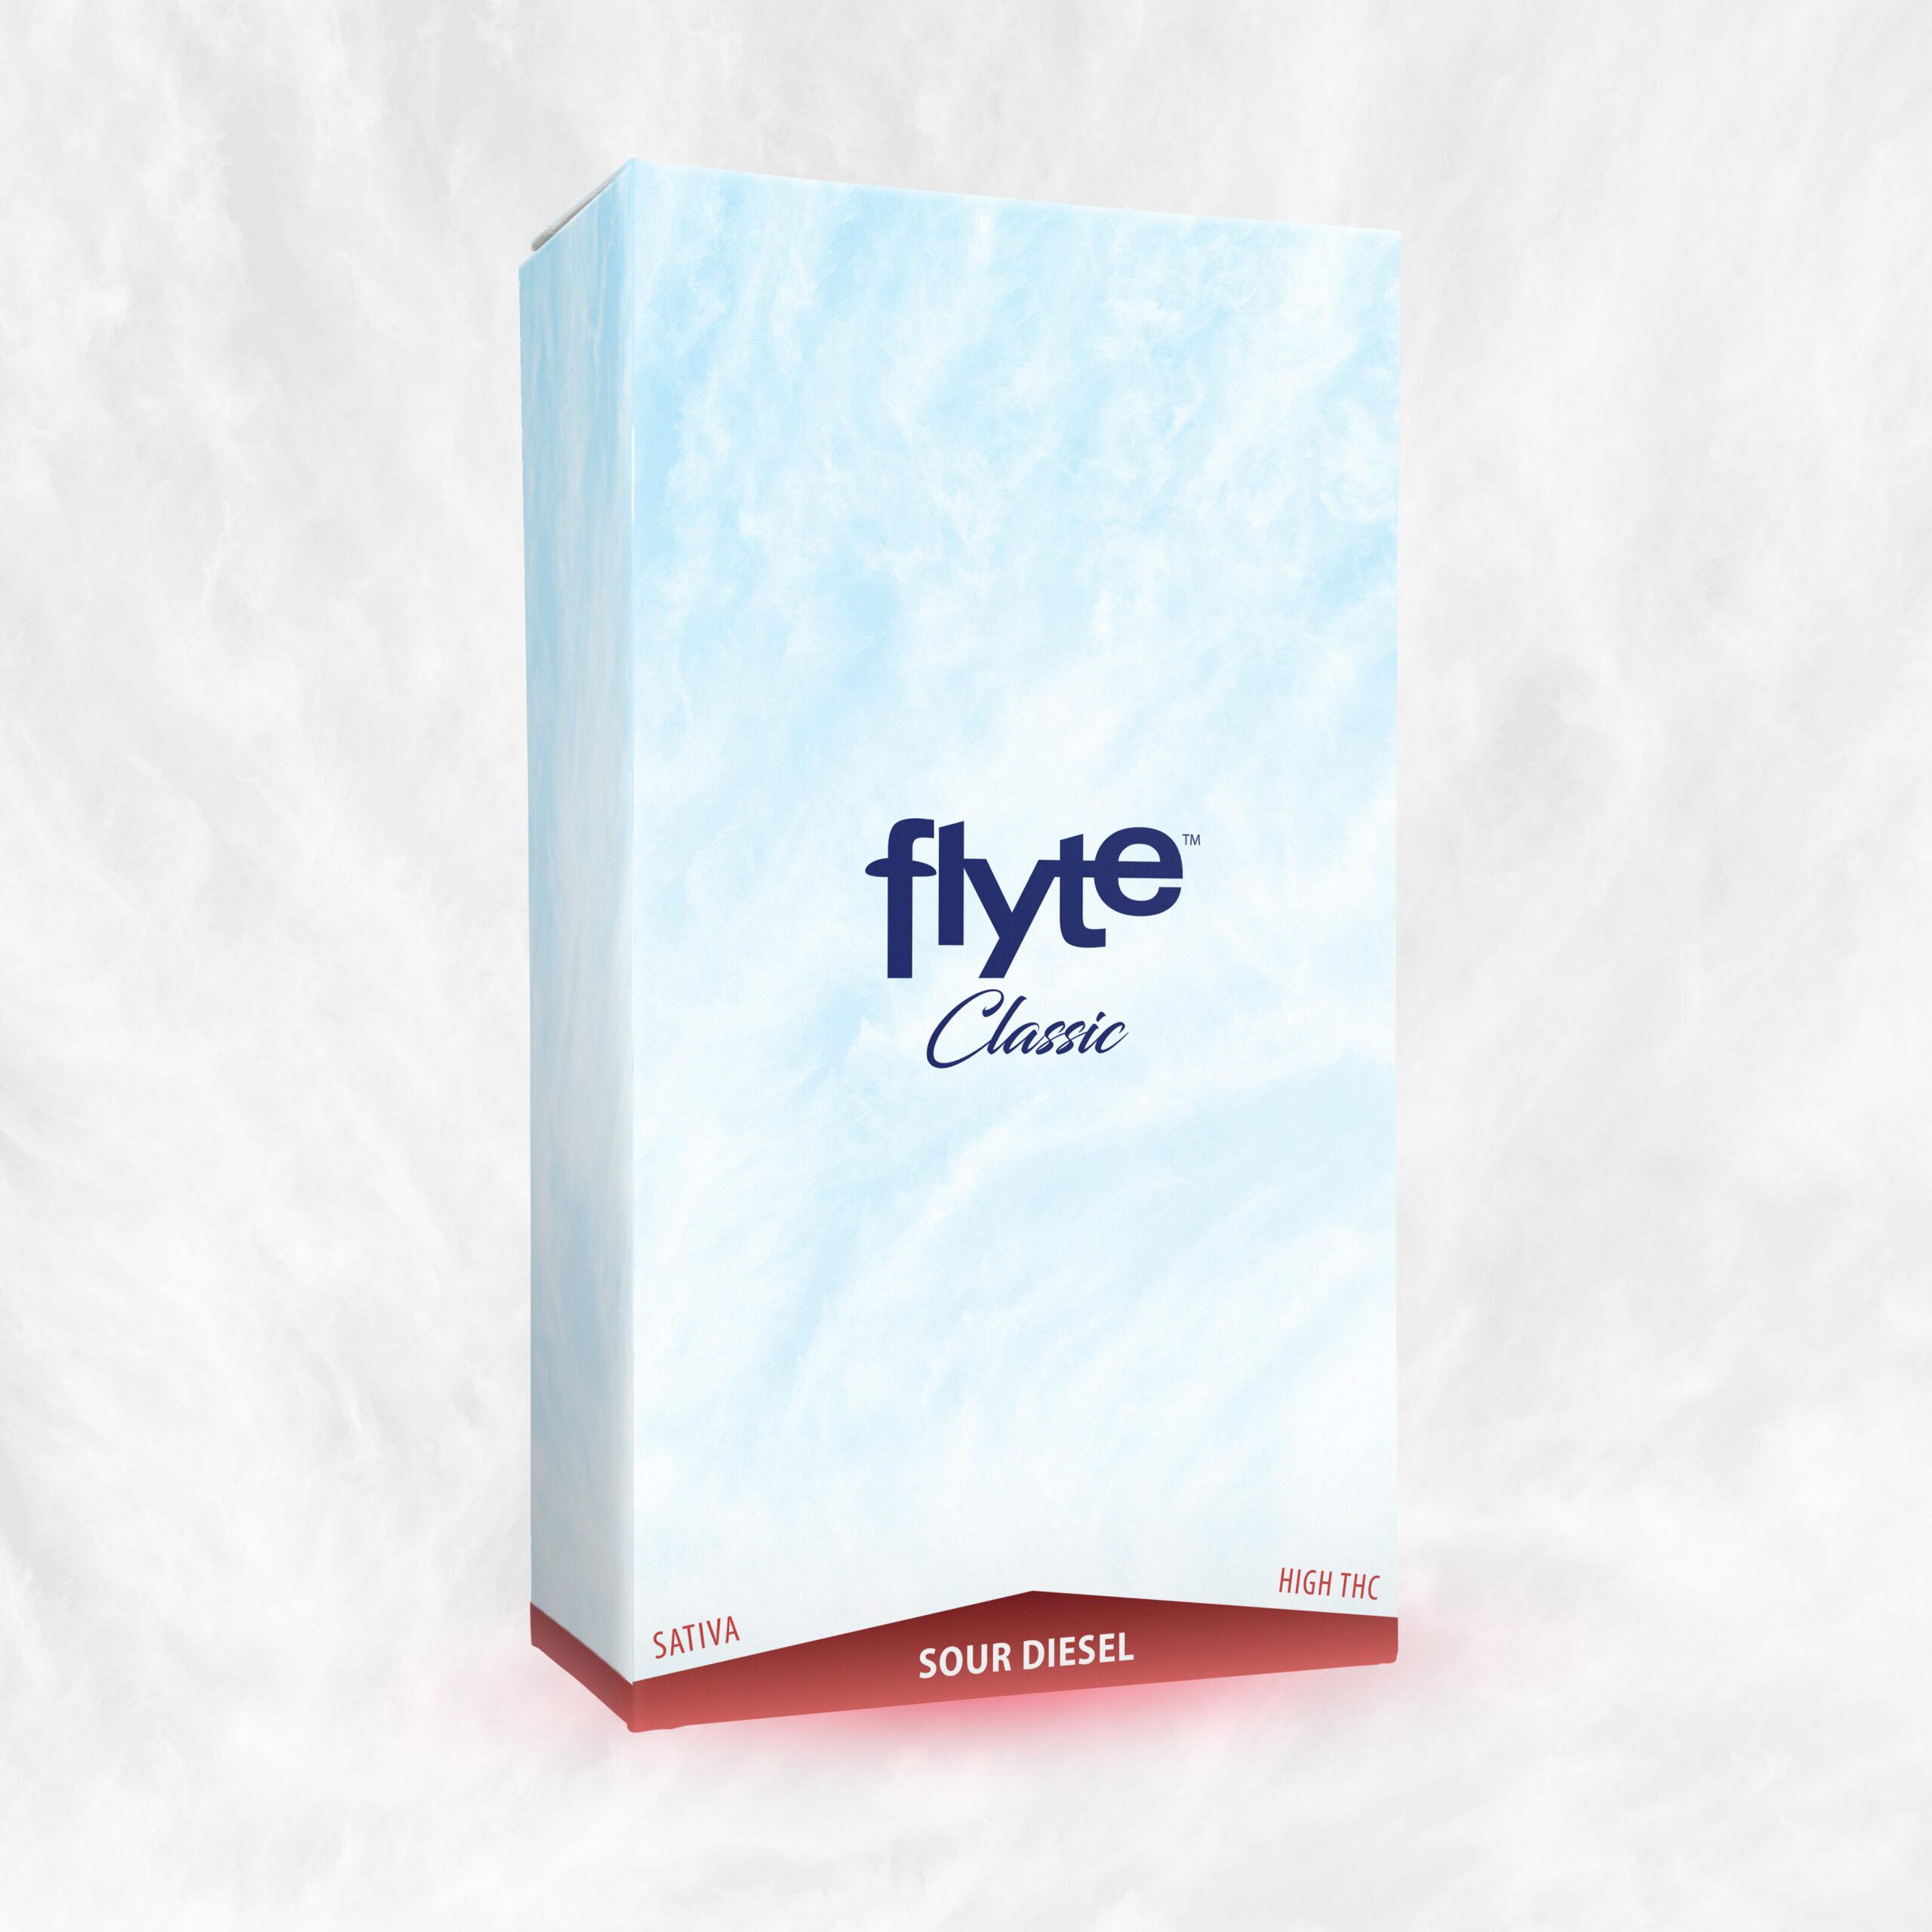 Flyte Classic cartridge glamour render